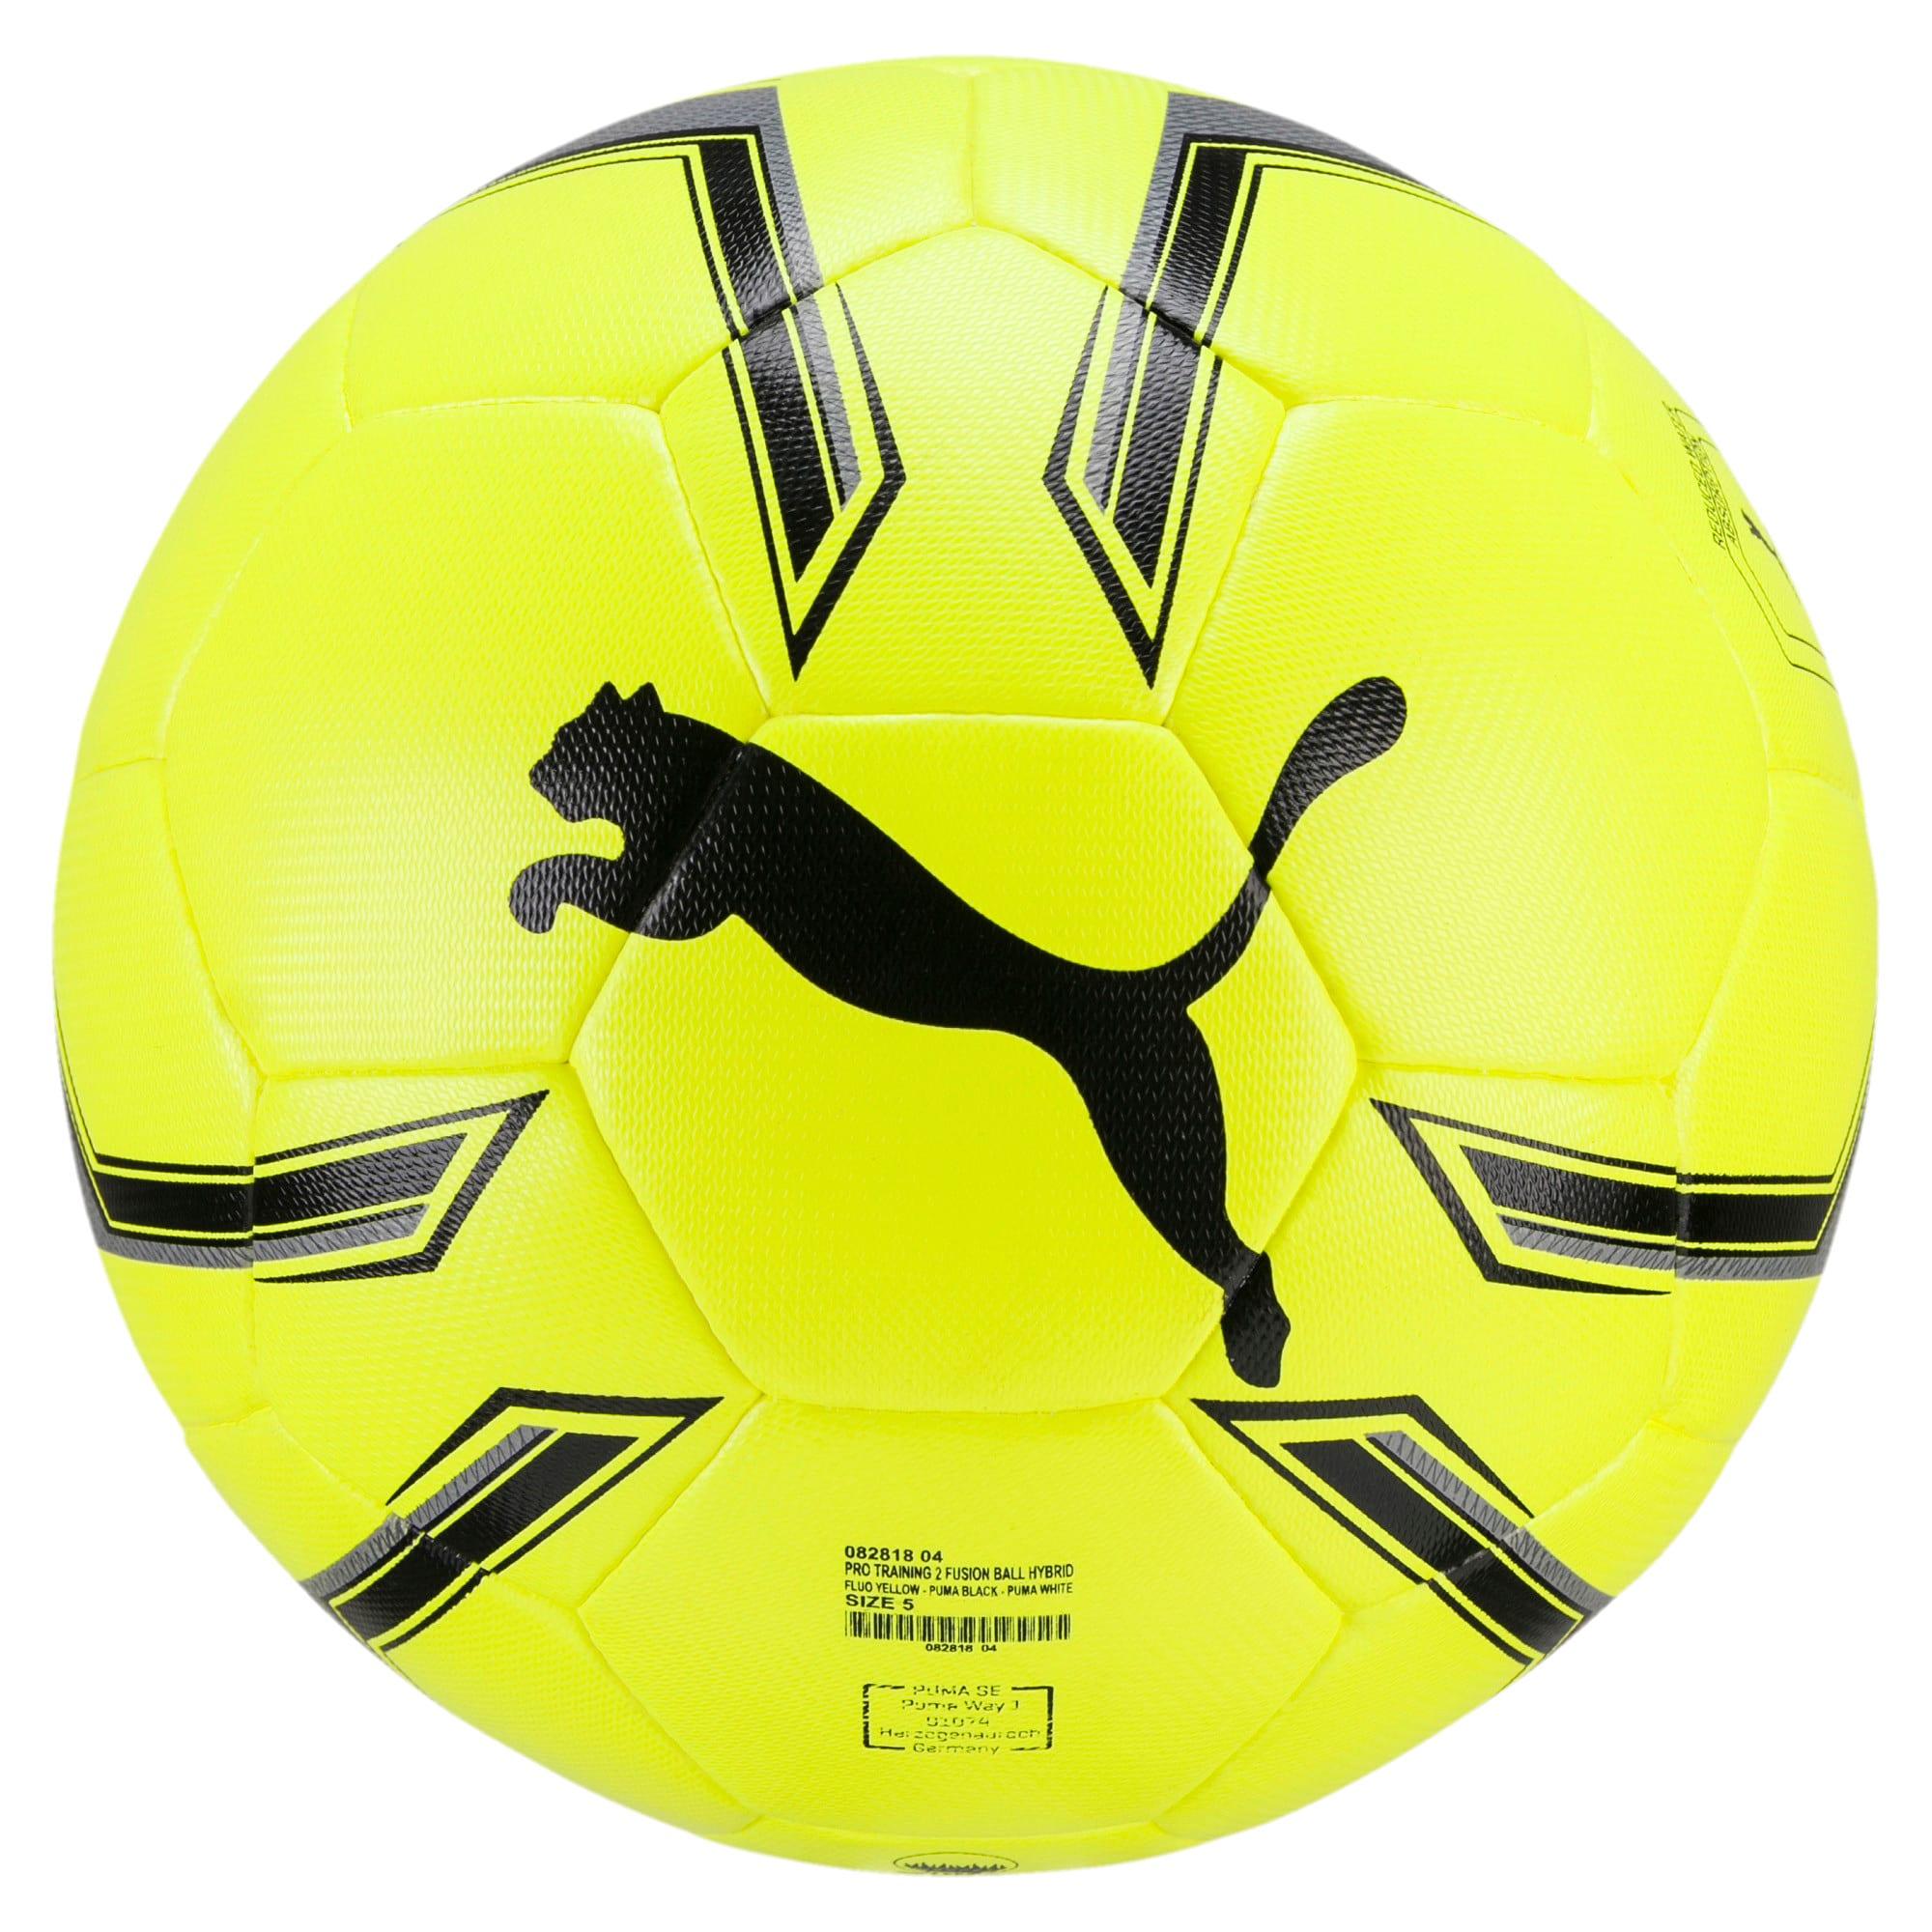 Thumbnail 1 of Pro Training 2 HYBRID Soccer Ball, Fluo Yellow-Black-White, medium